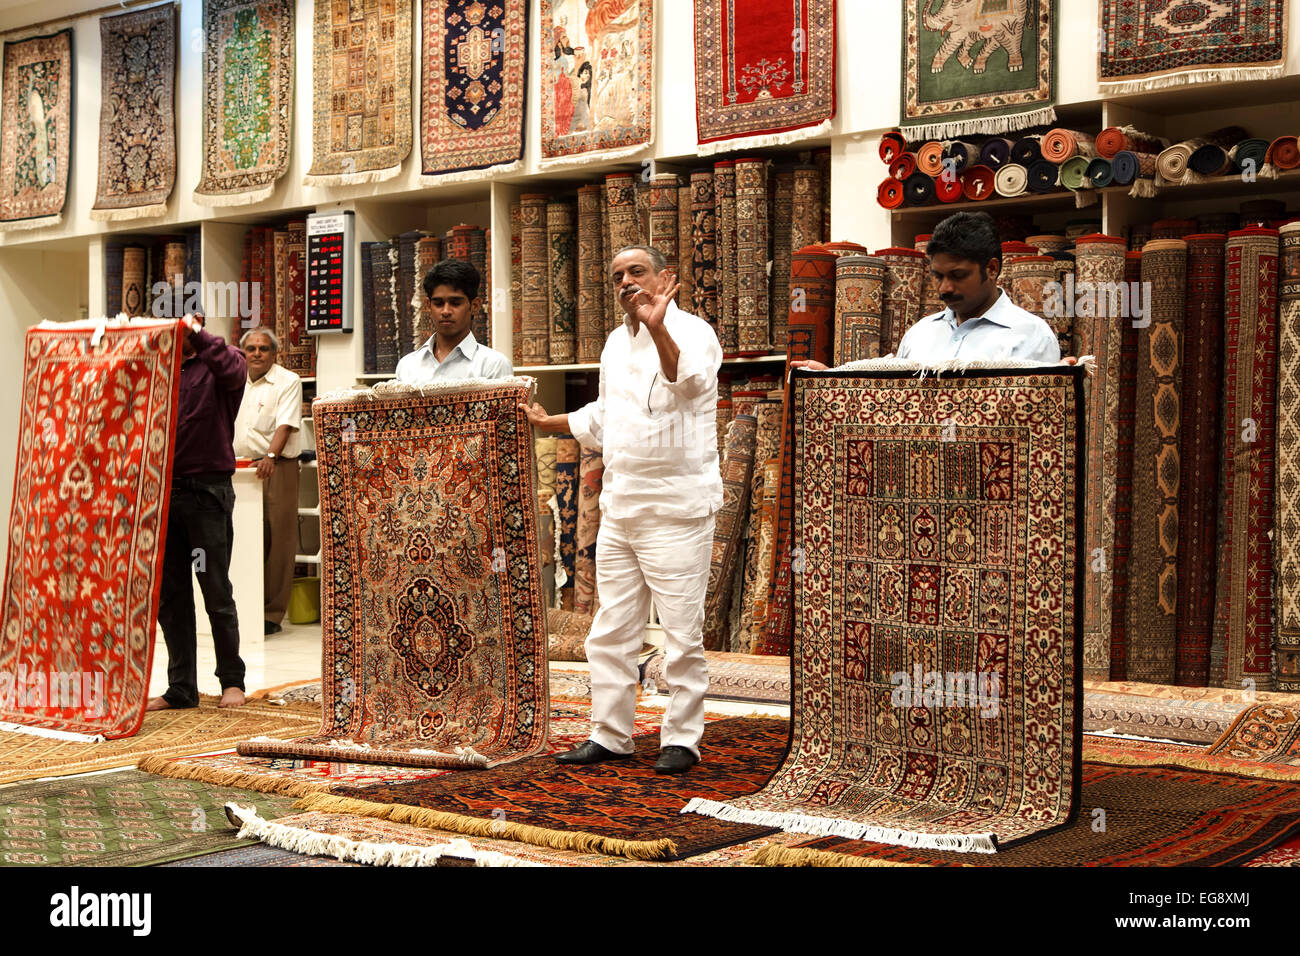 Carpet salesman in showroom, Jaipur, Rajasthan, India - Stock Image